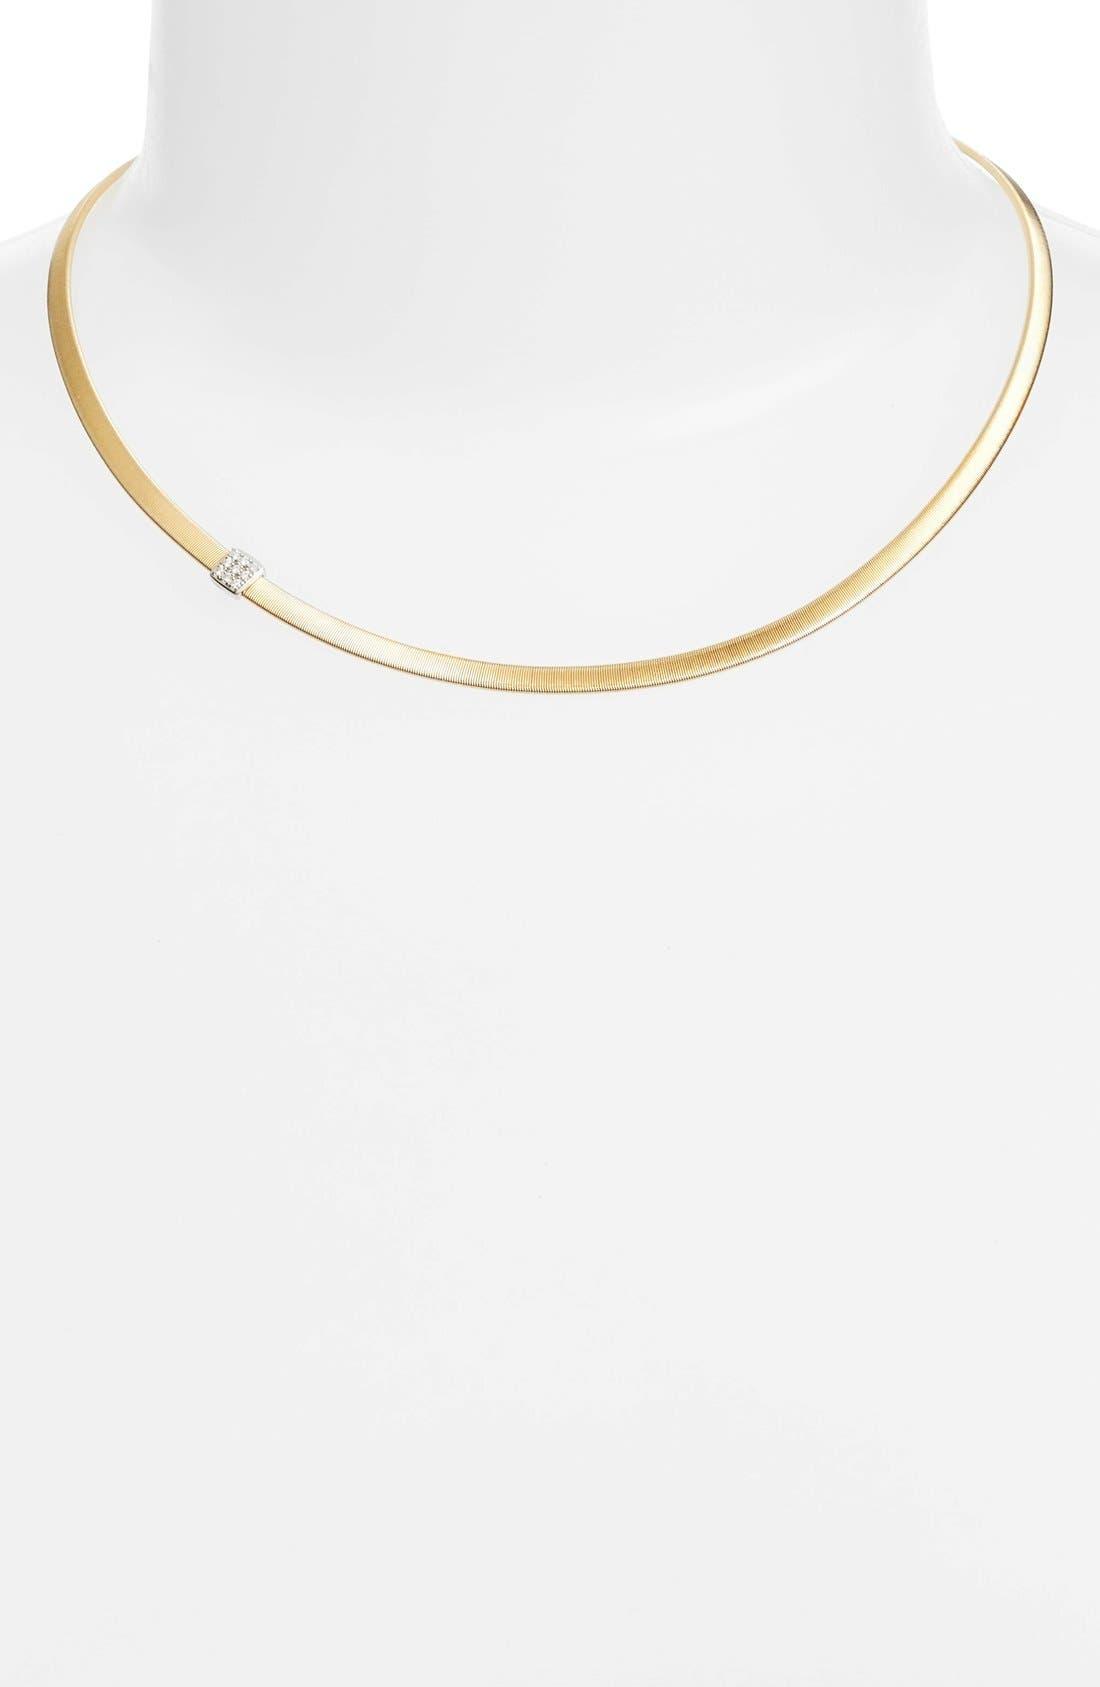 Masai Diamond Collar Necklace,                             Alternate thumbnail 5, color,                             YELLOW GOLD